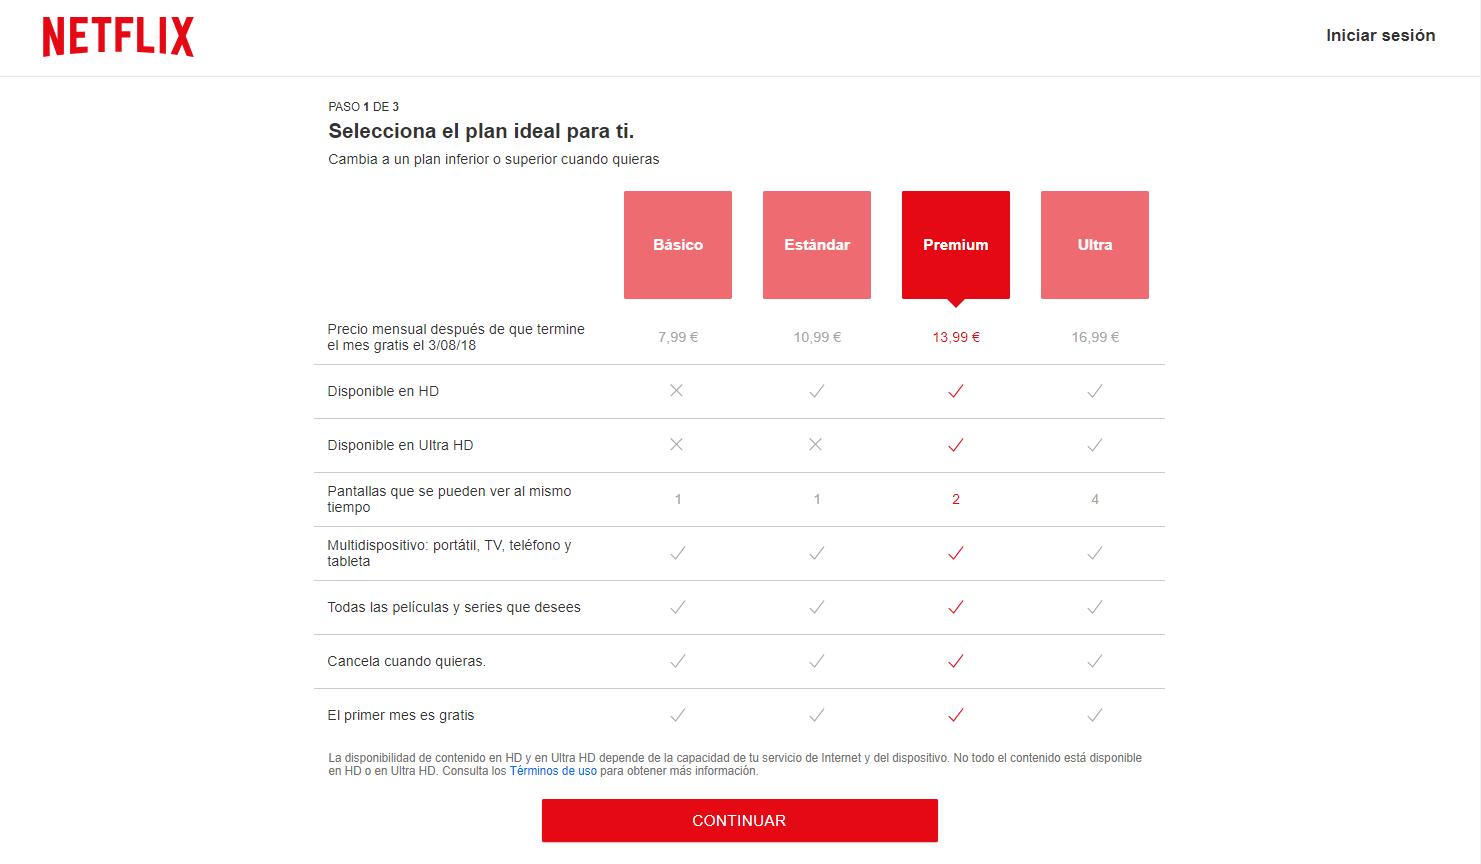 Netflix Plan Ultra vs Premium